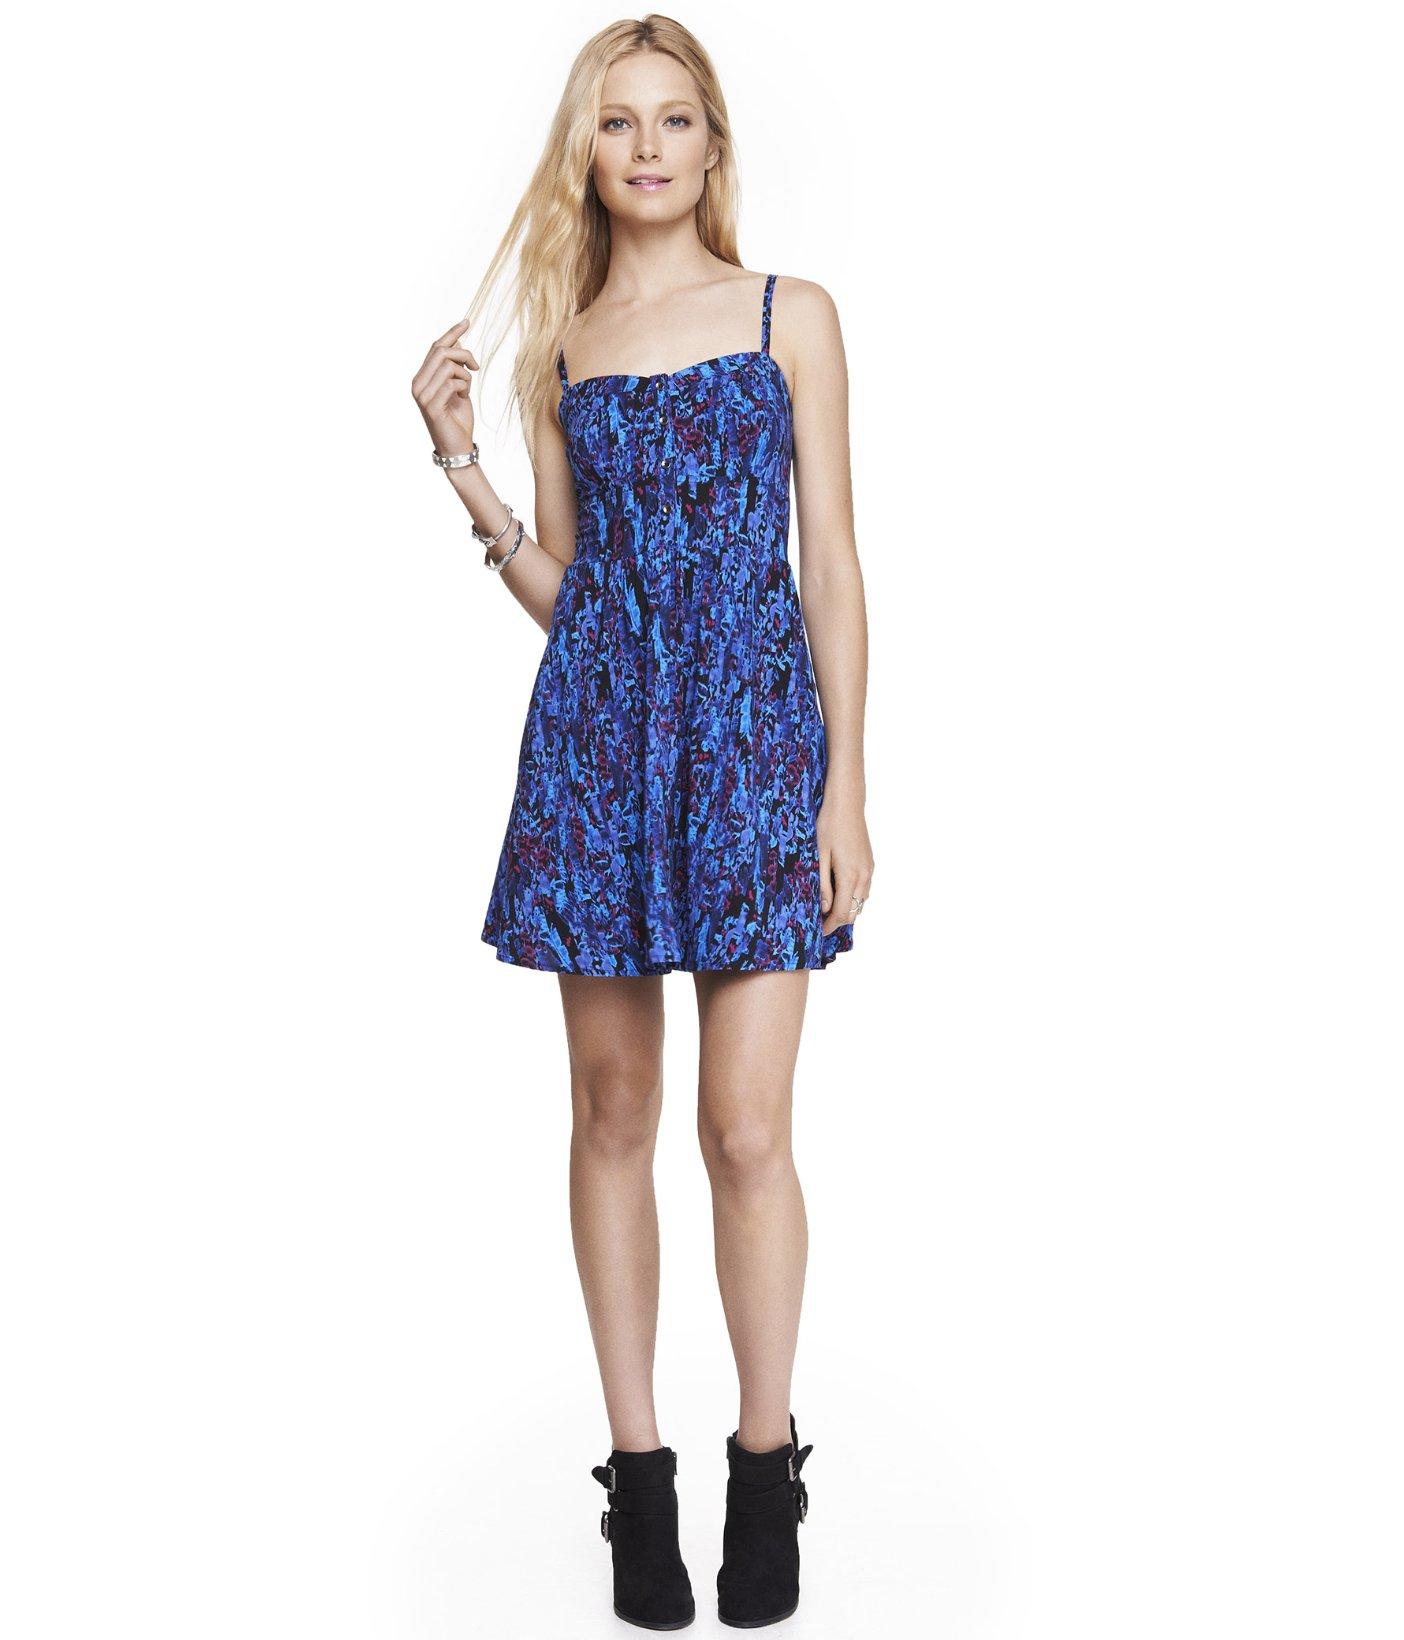 8dfaadcd3d Lyst - Express Blue Floral Cami Sundress in Blue